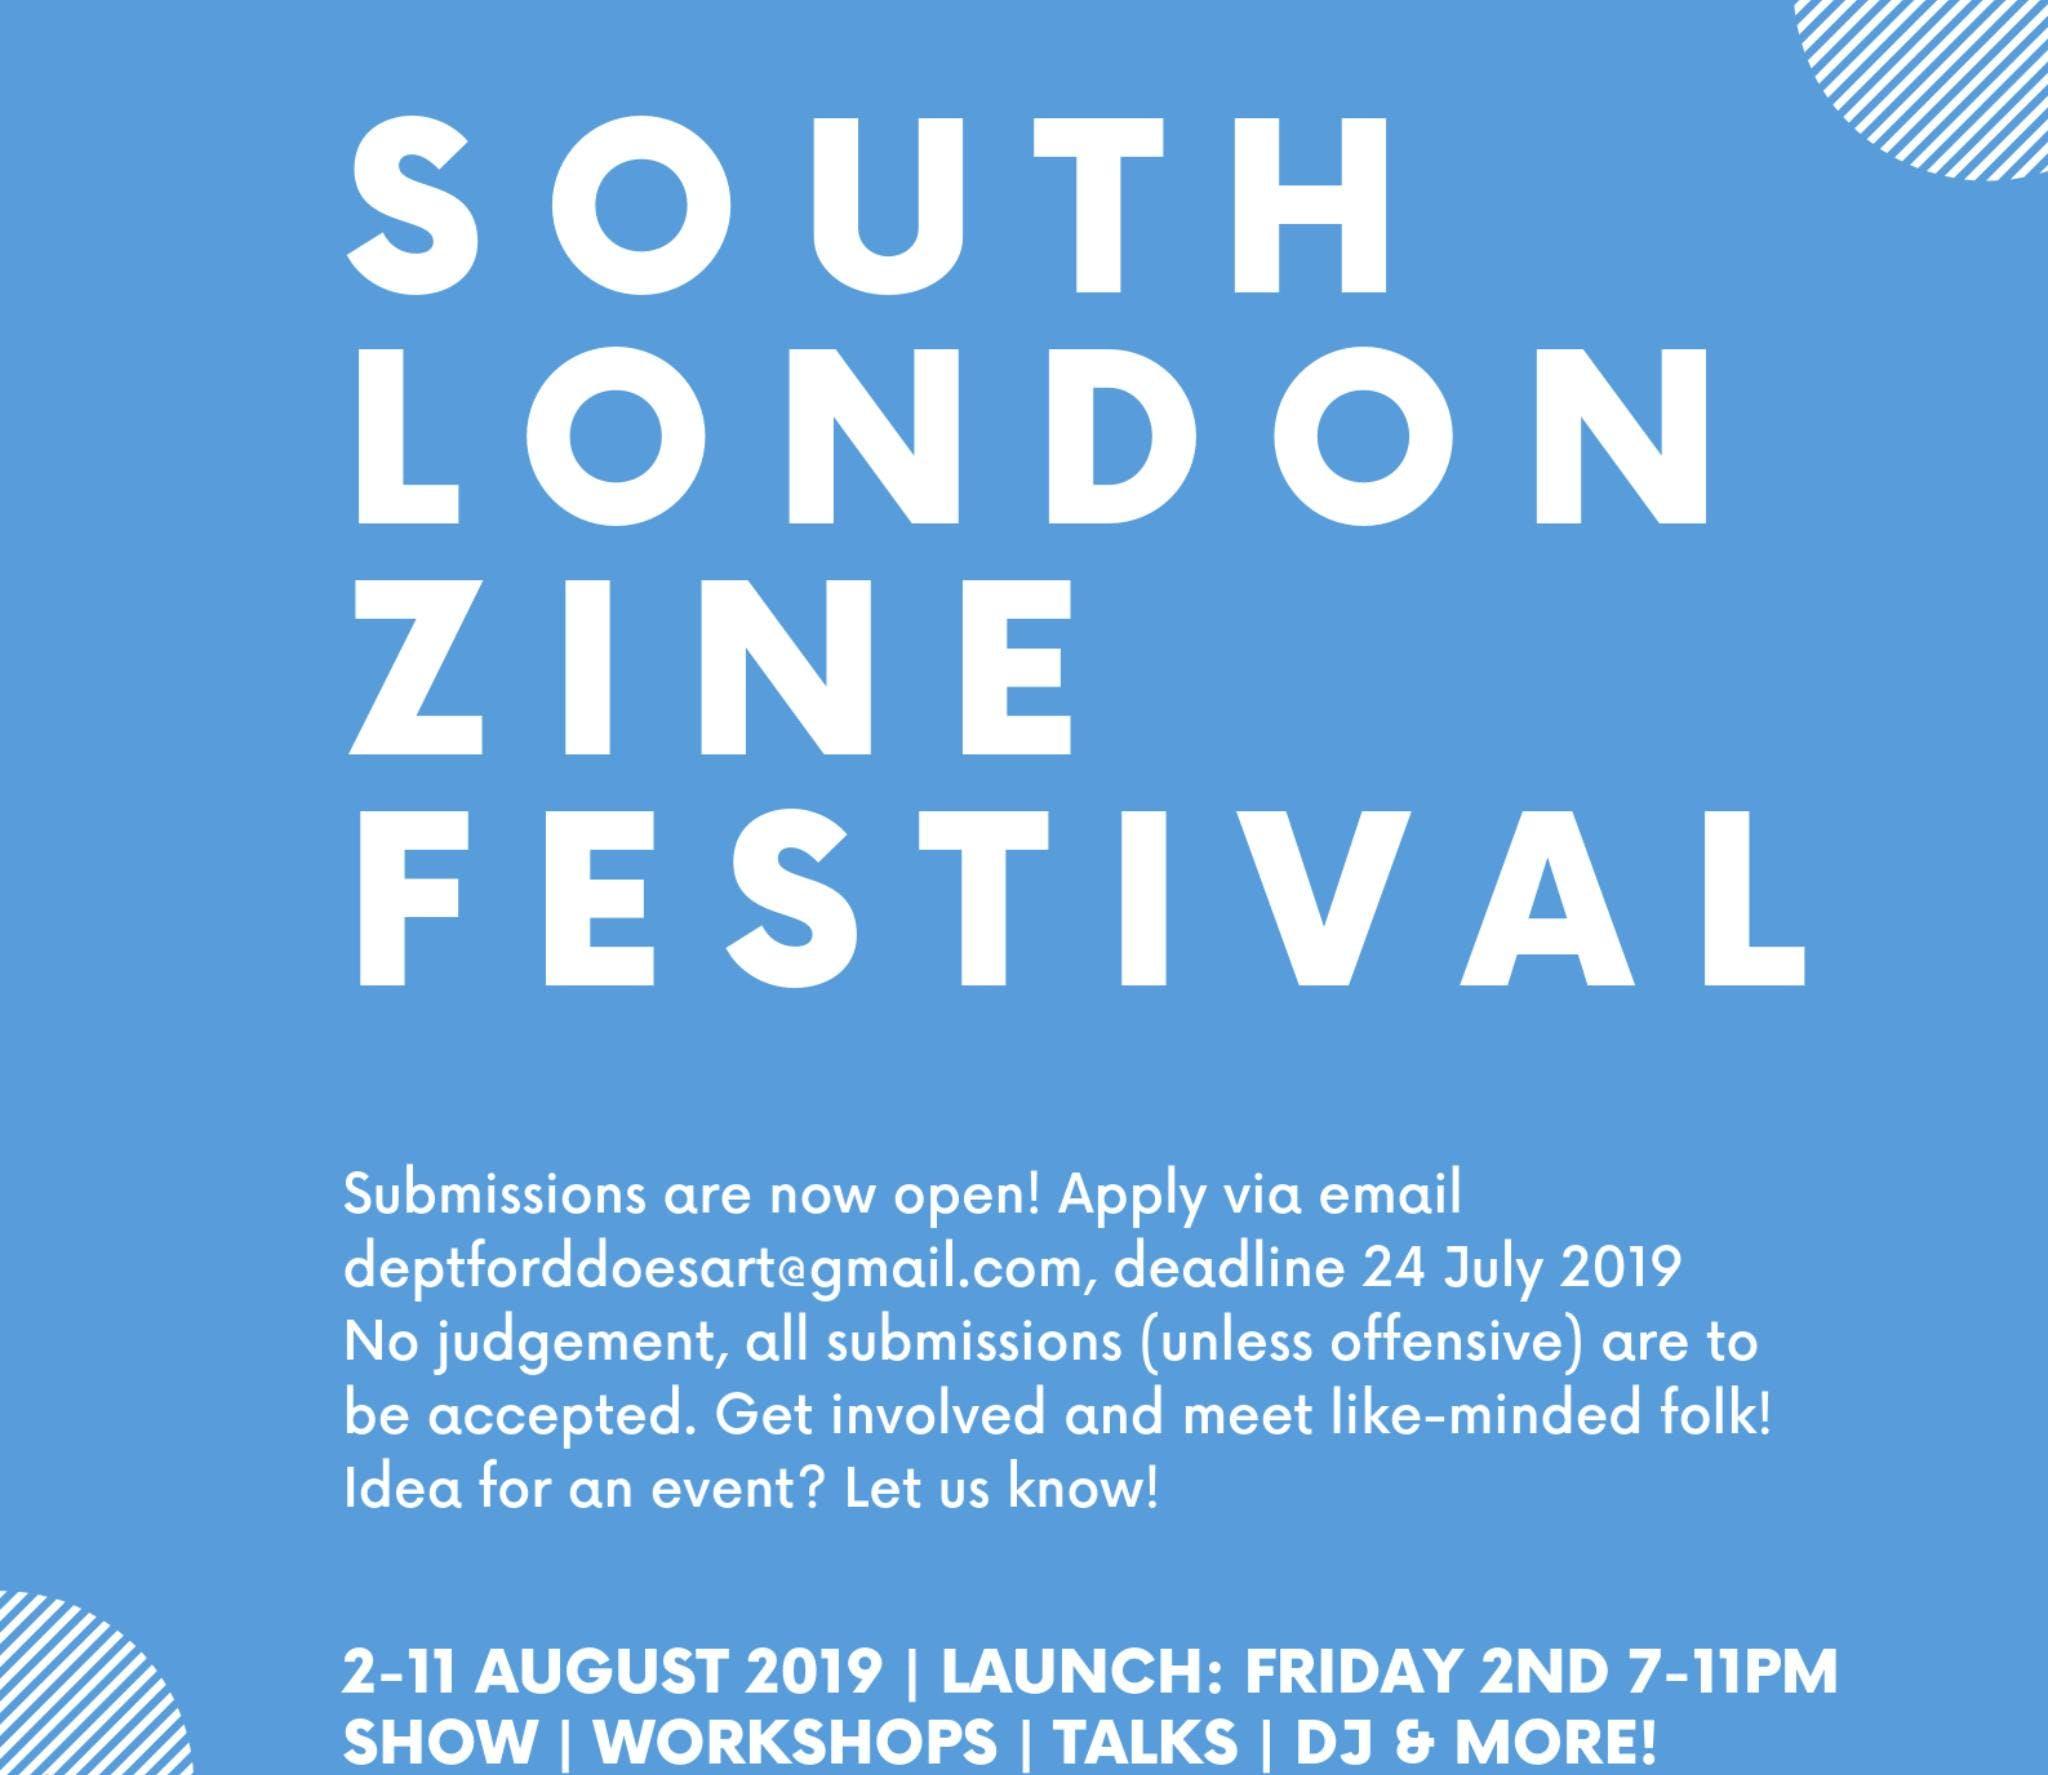 South London Zine Festival 2019